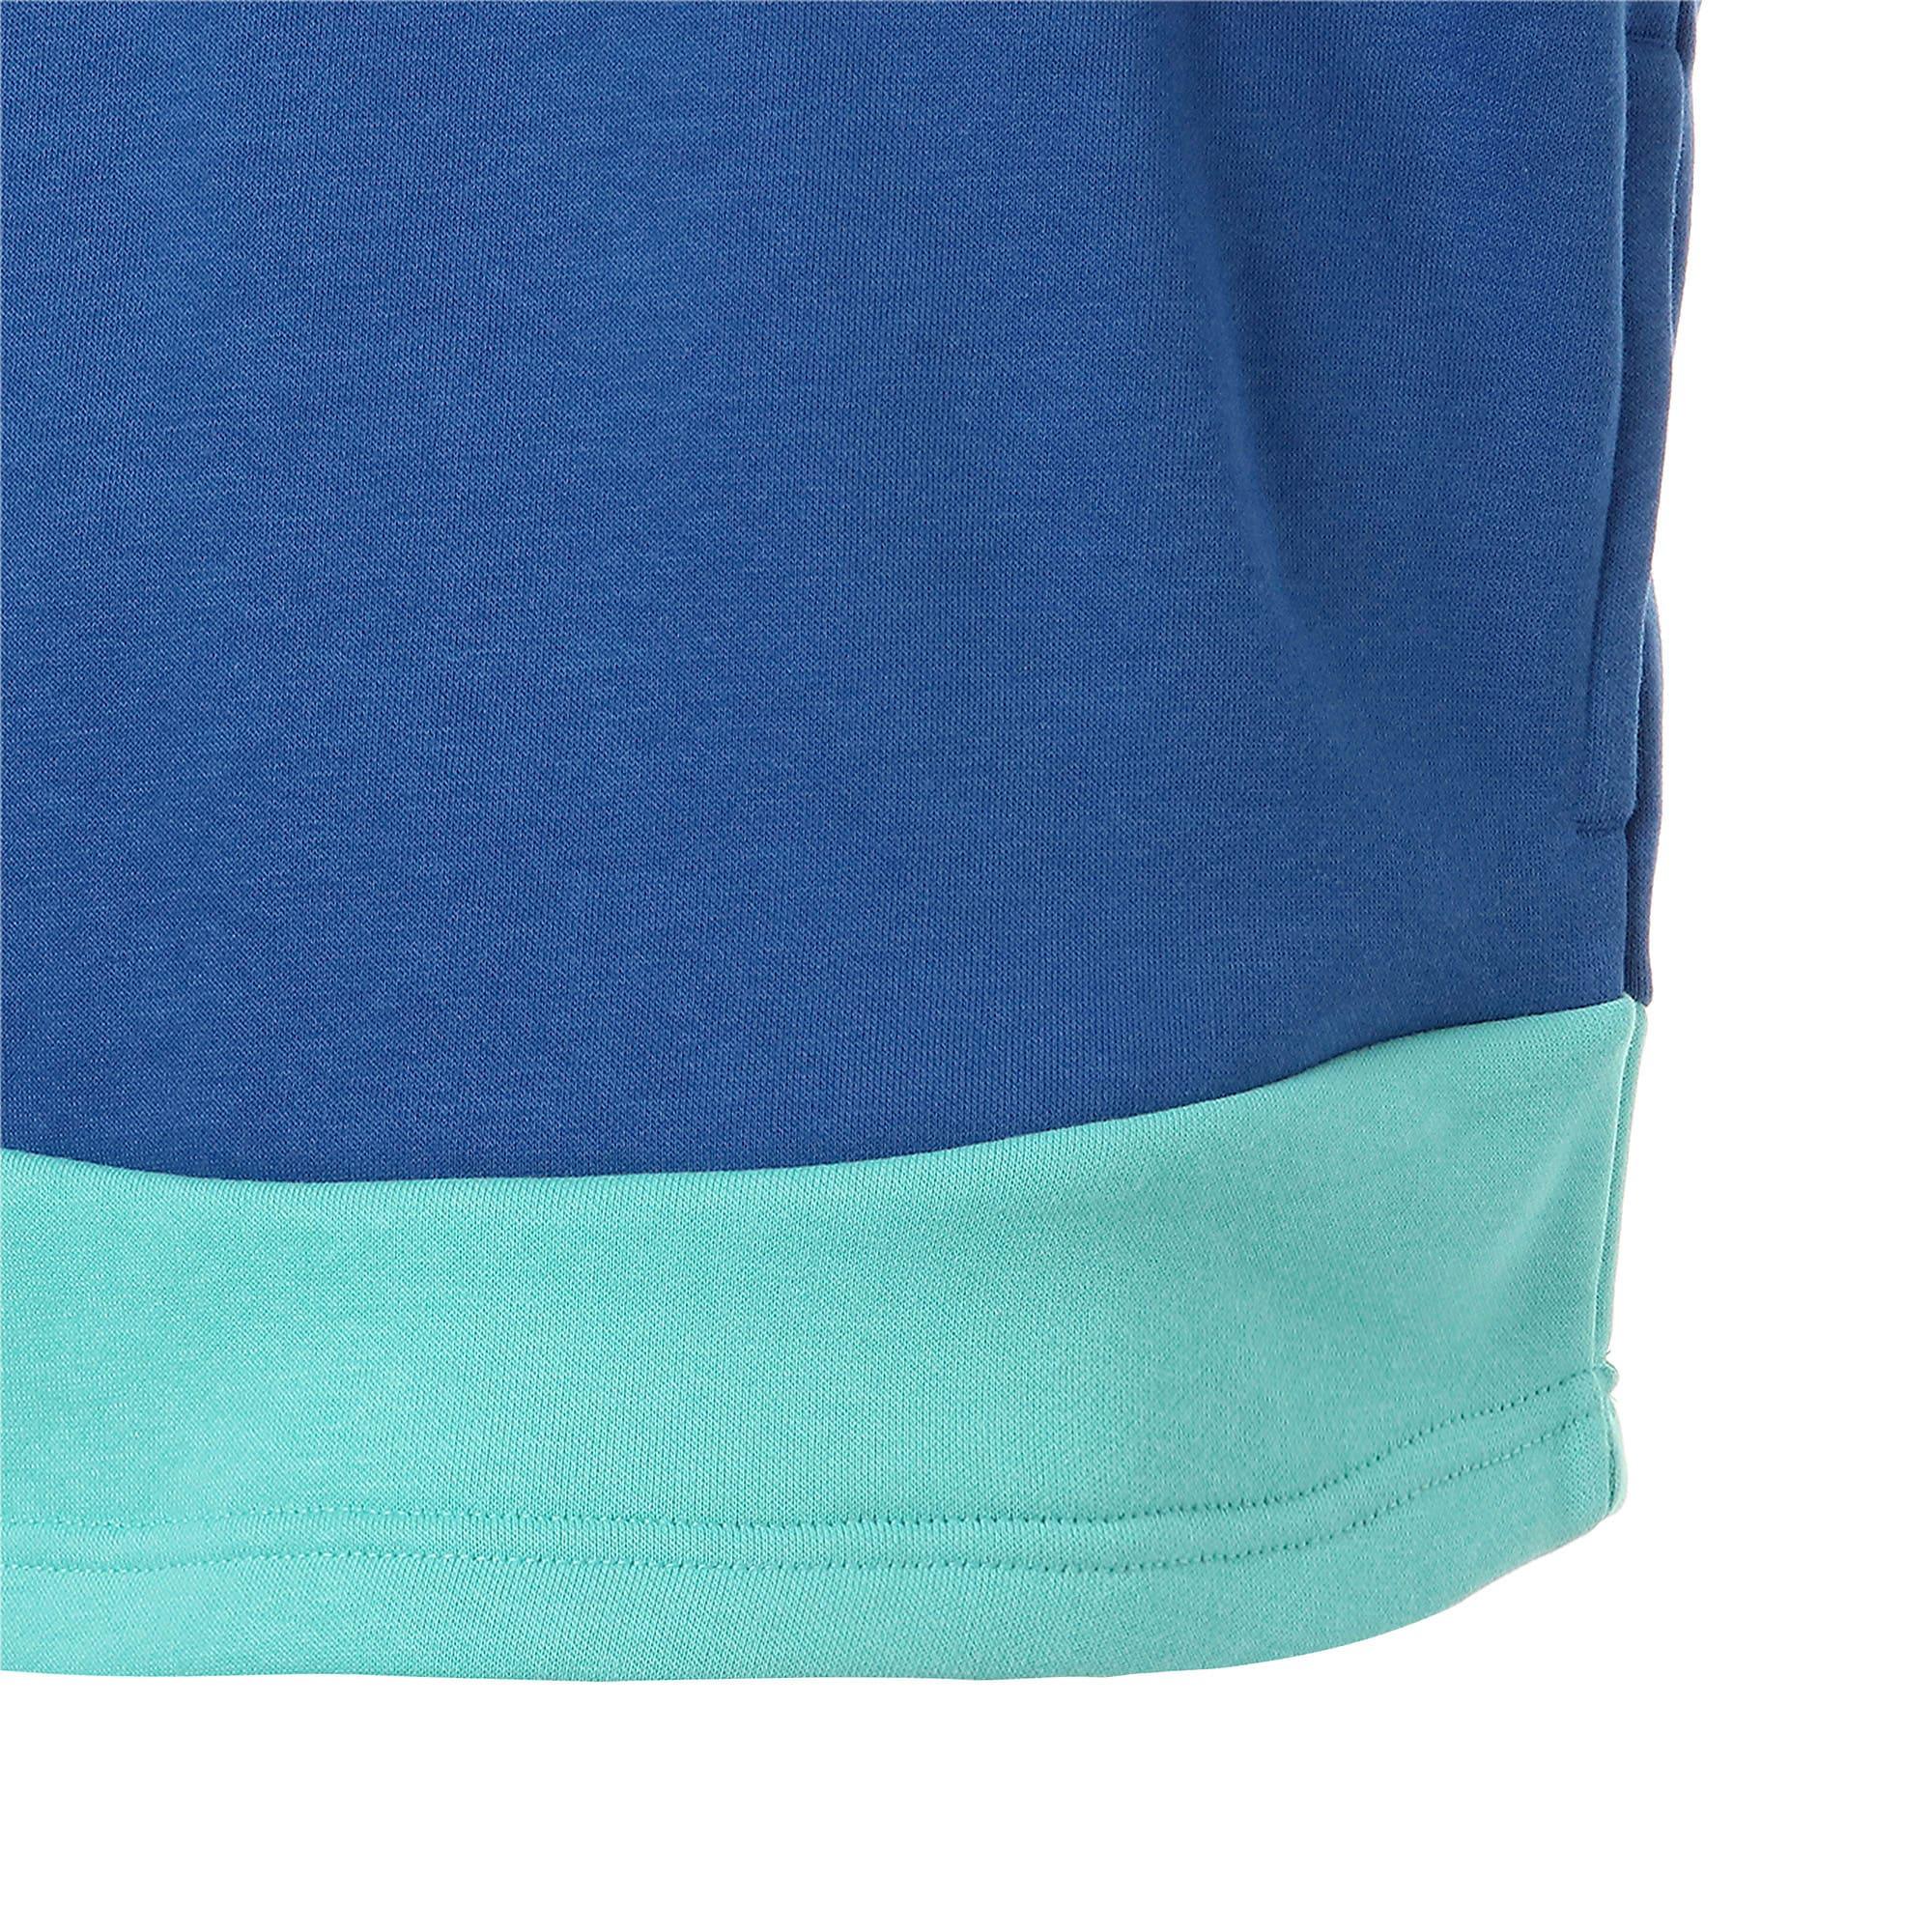 Thumbnail 6 of キッズ アルファ アドバンス フーディー FL, Galaxy Blue, medium-JPN